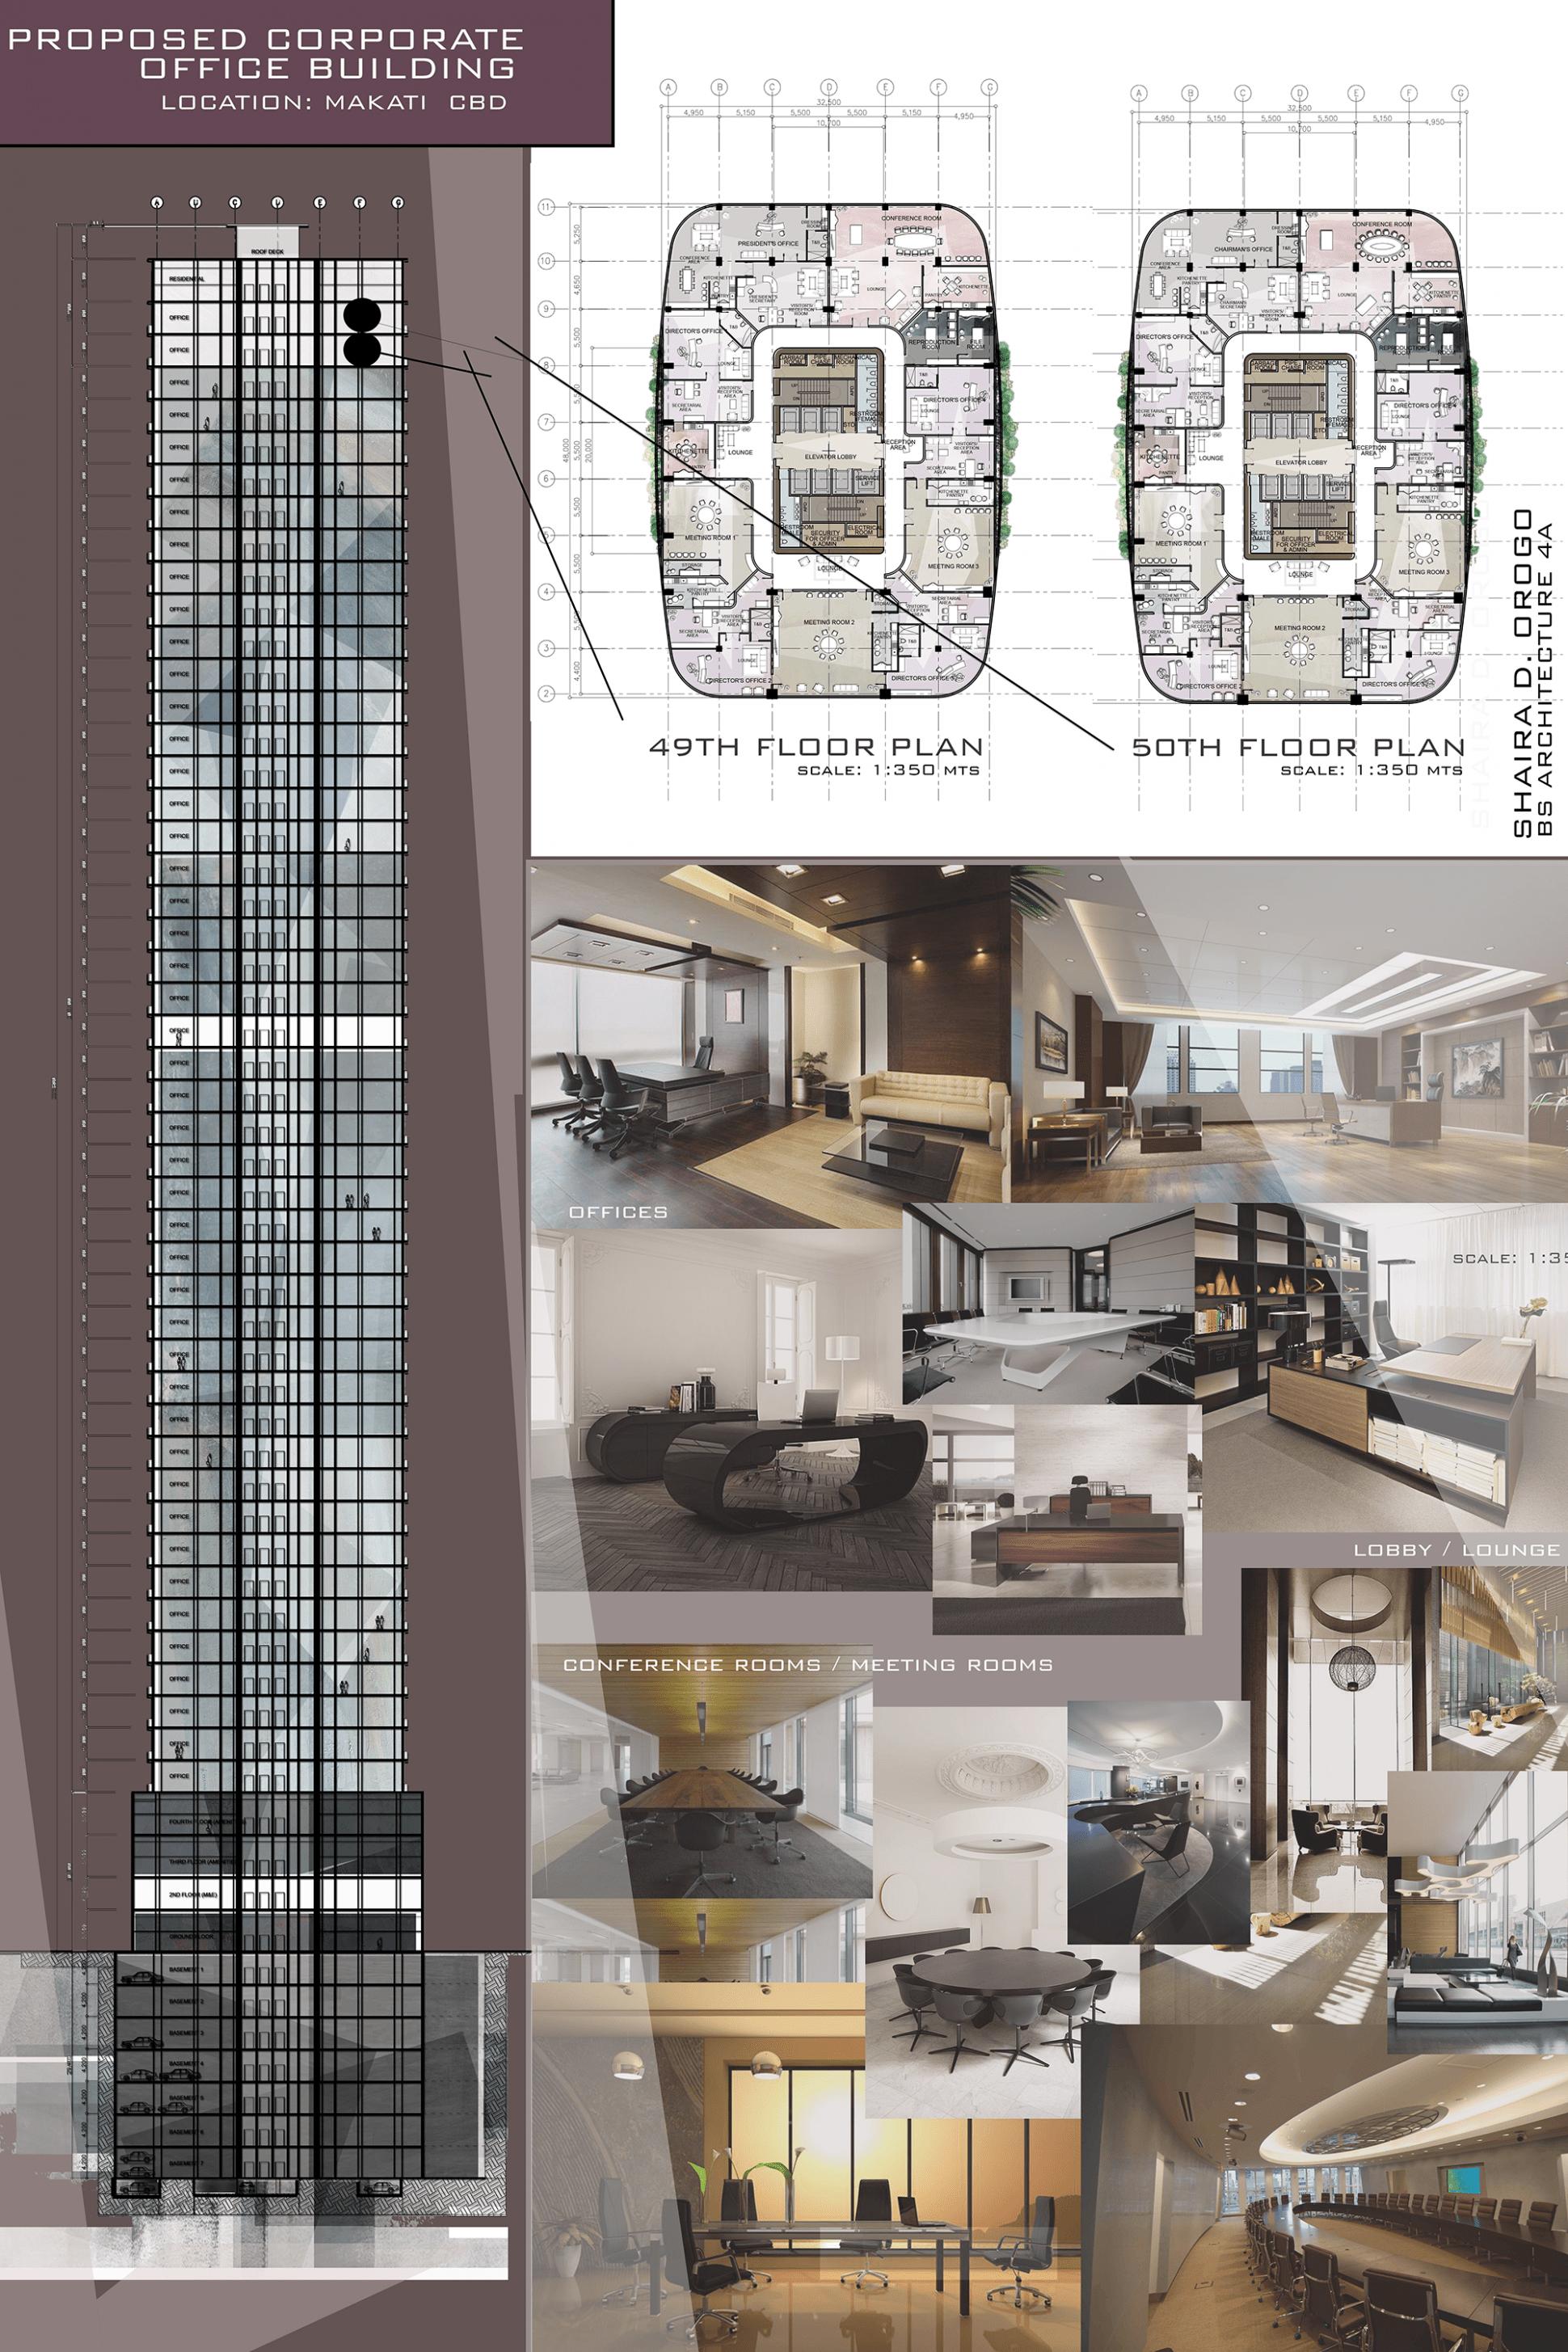 Pin By Nathania Oktarina On Diseno Office Building Plans Office Building Architecture Architecture Building Design